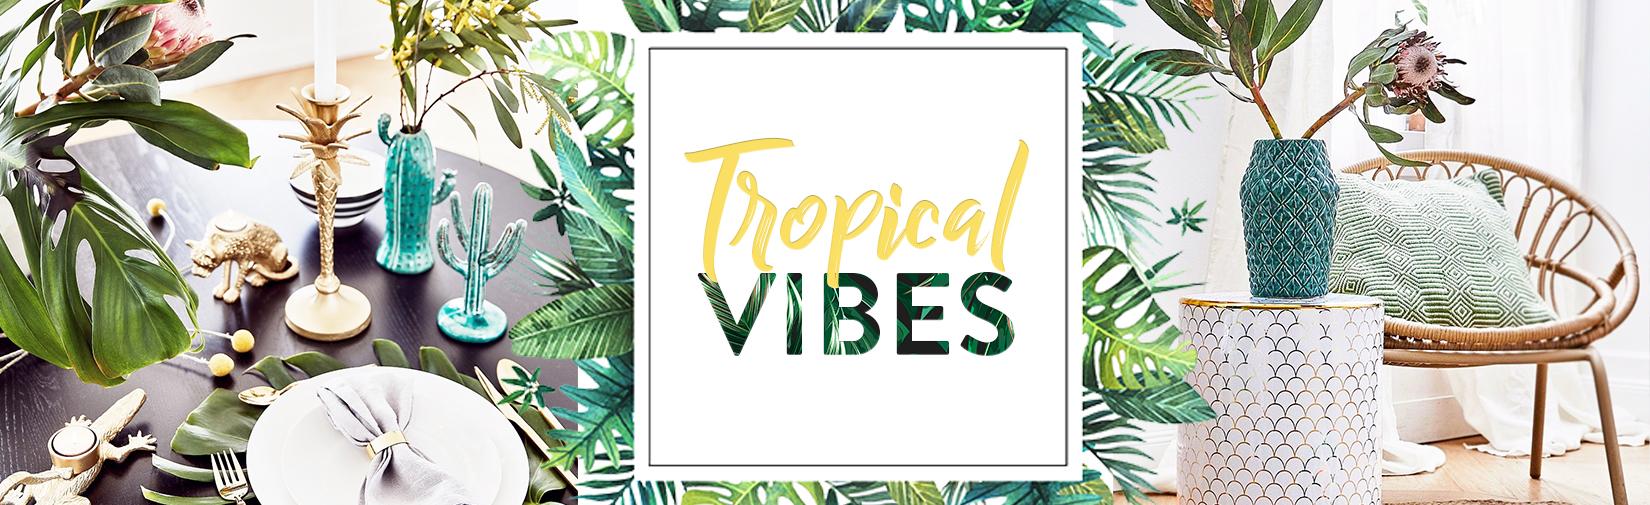 TropicalVibes_LP_desktop